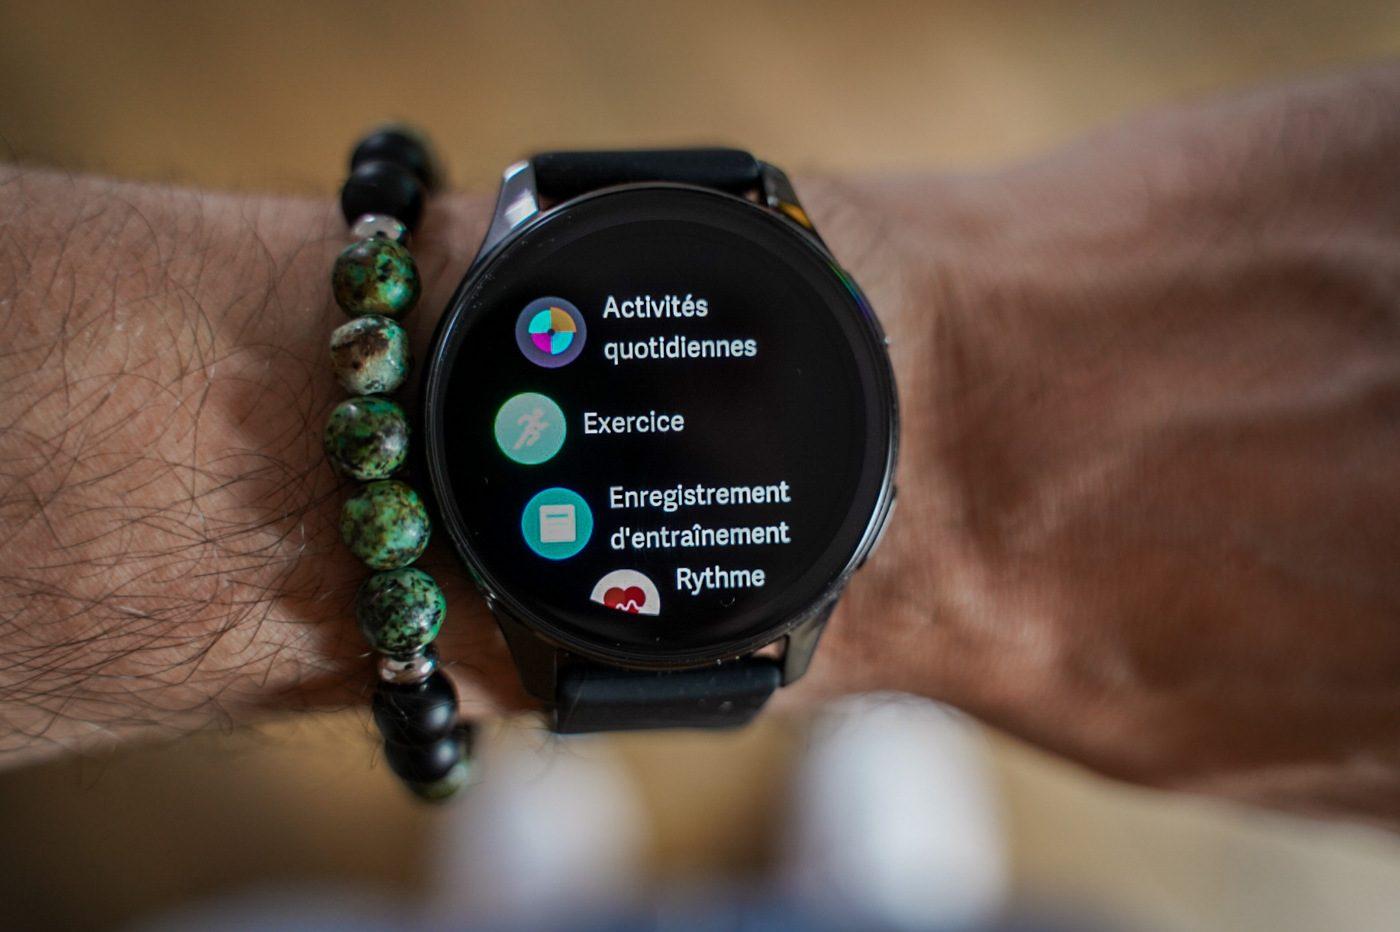 test oneplus watch fonctionnalites